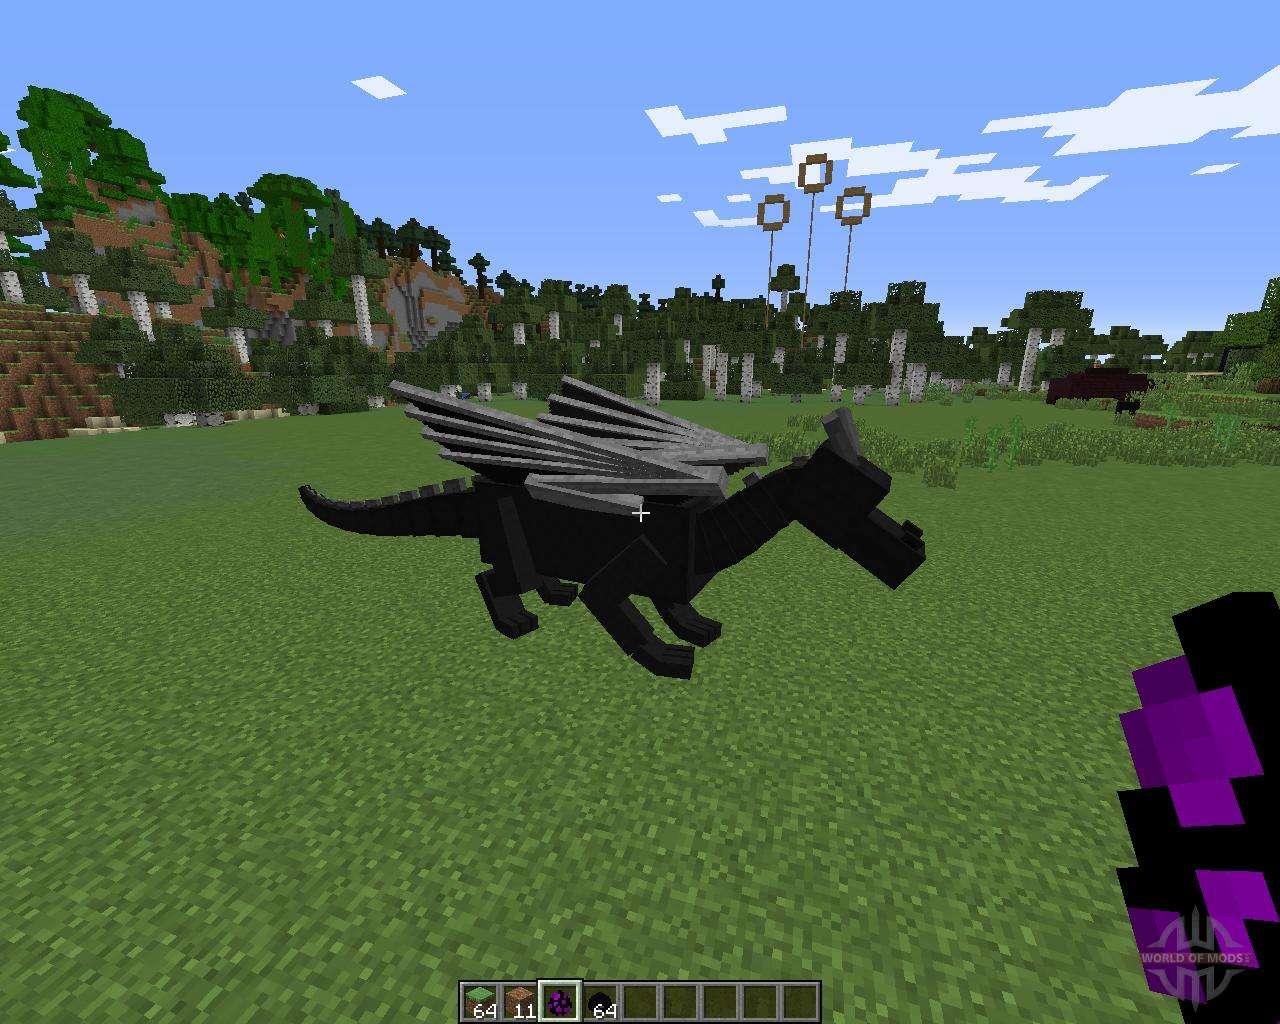 скачать мод на dragon mounts для майнкрафт 1.5.2 #11